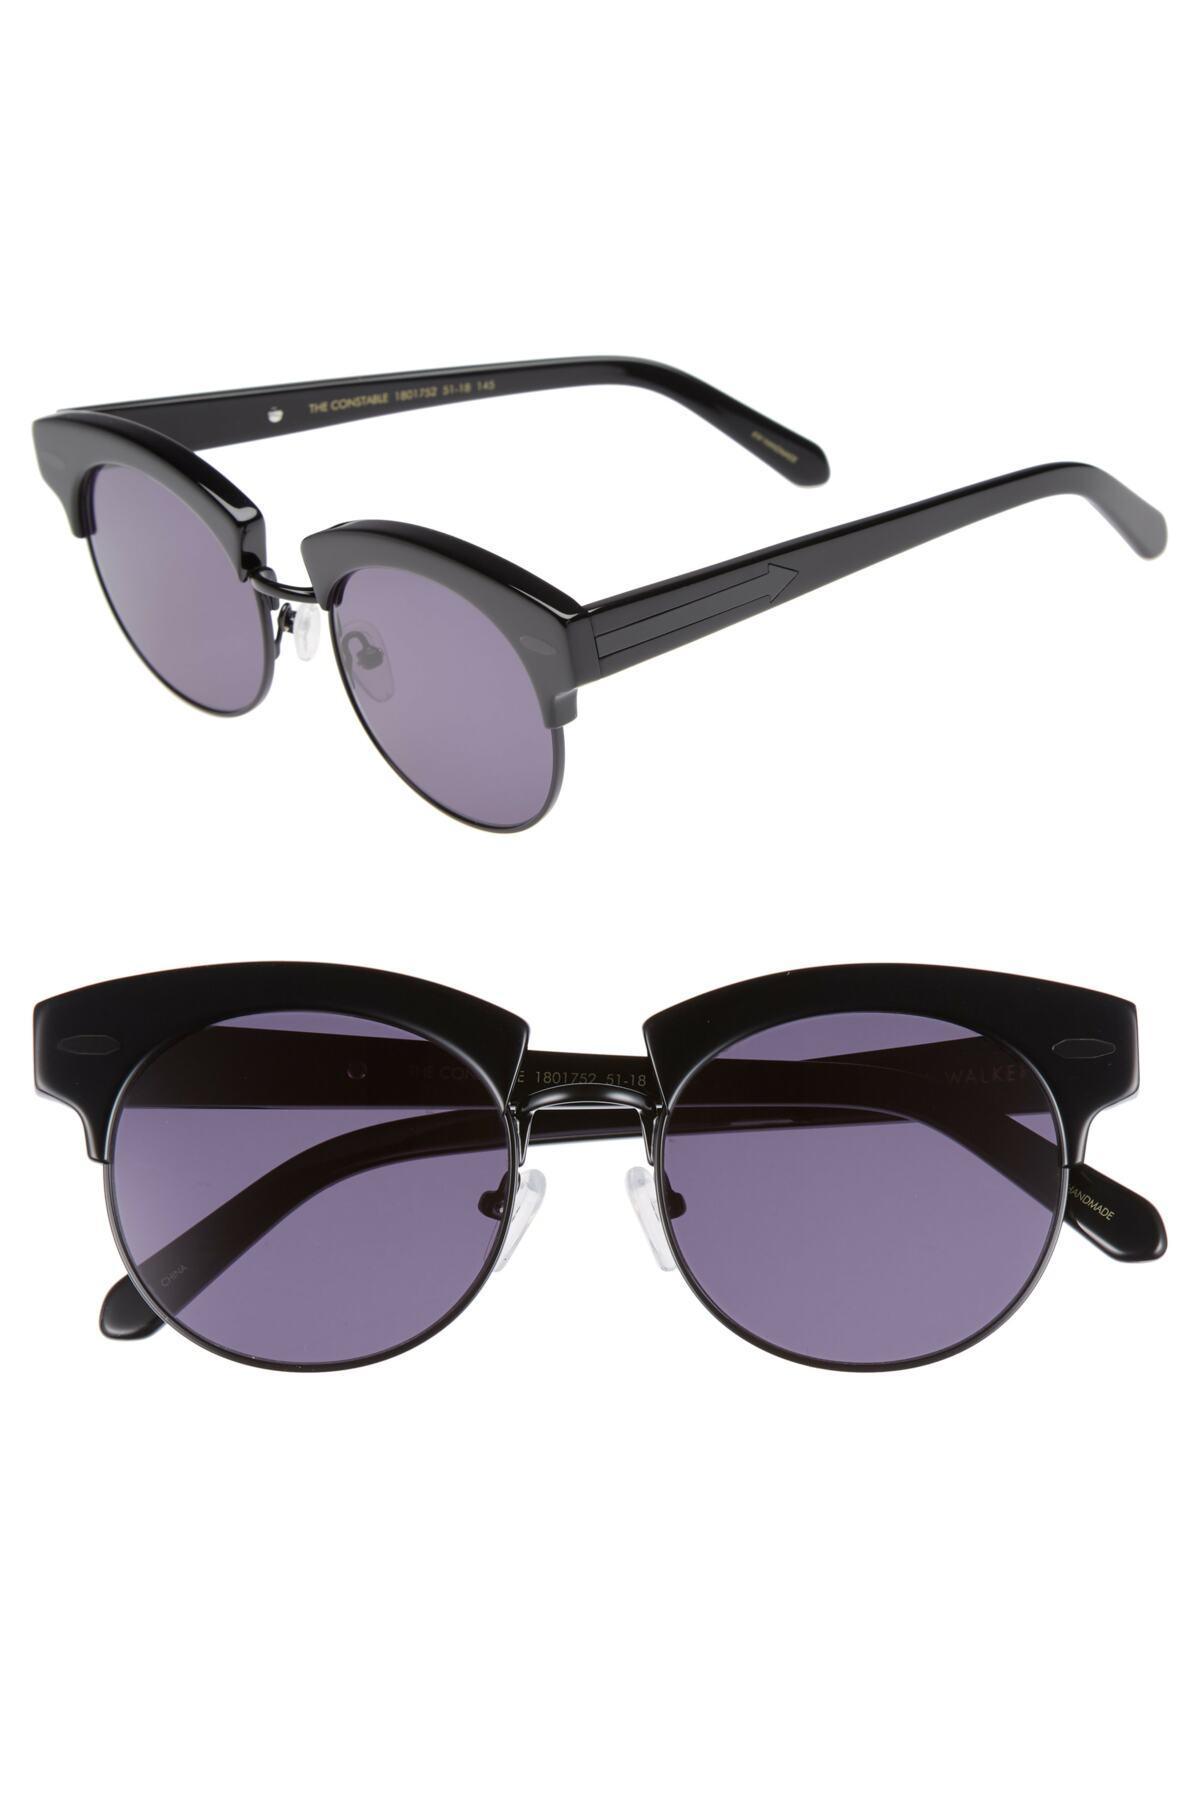 4e2c3534217c Lyst - Karen Walker The Constable 51mm Sunglasses in Black